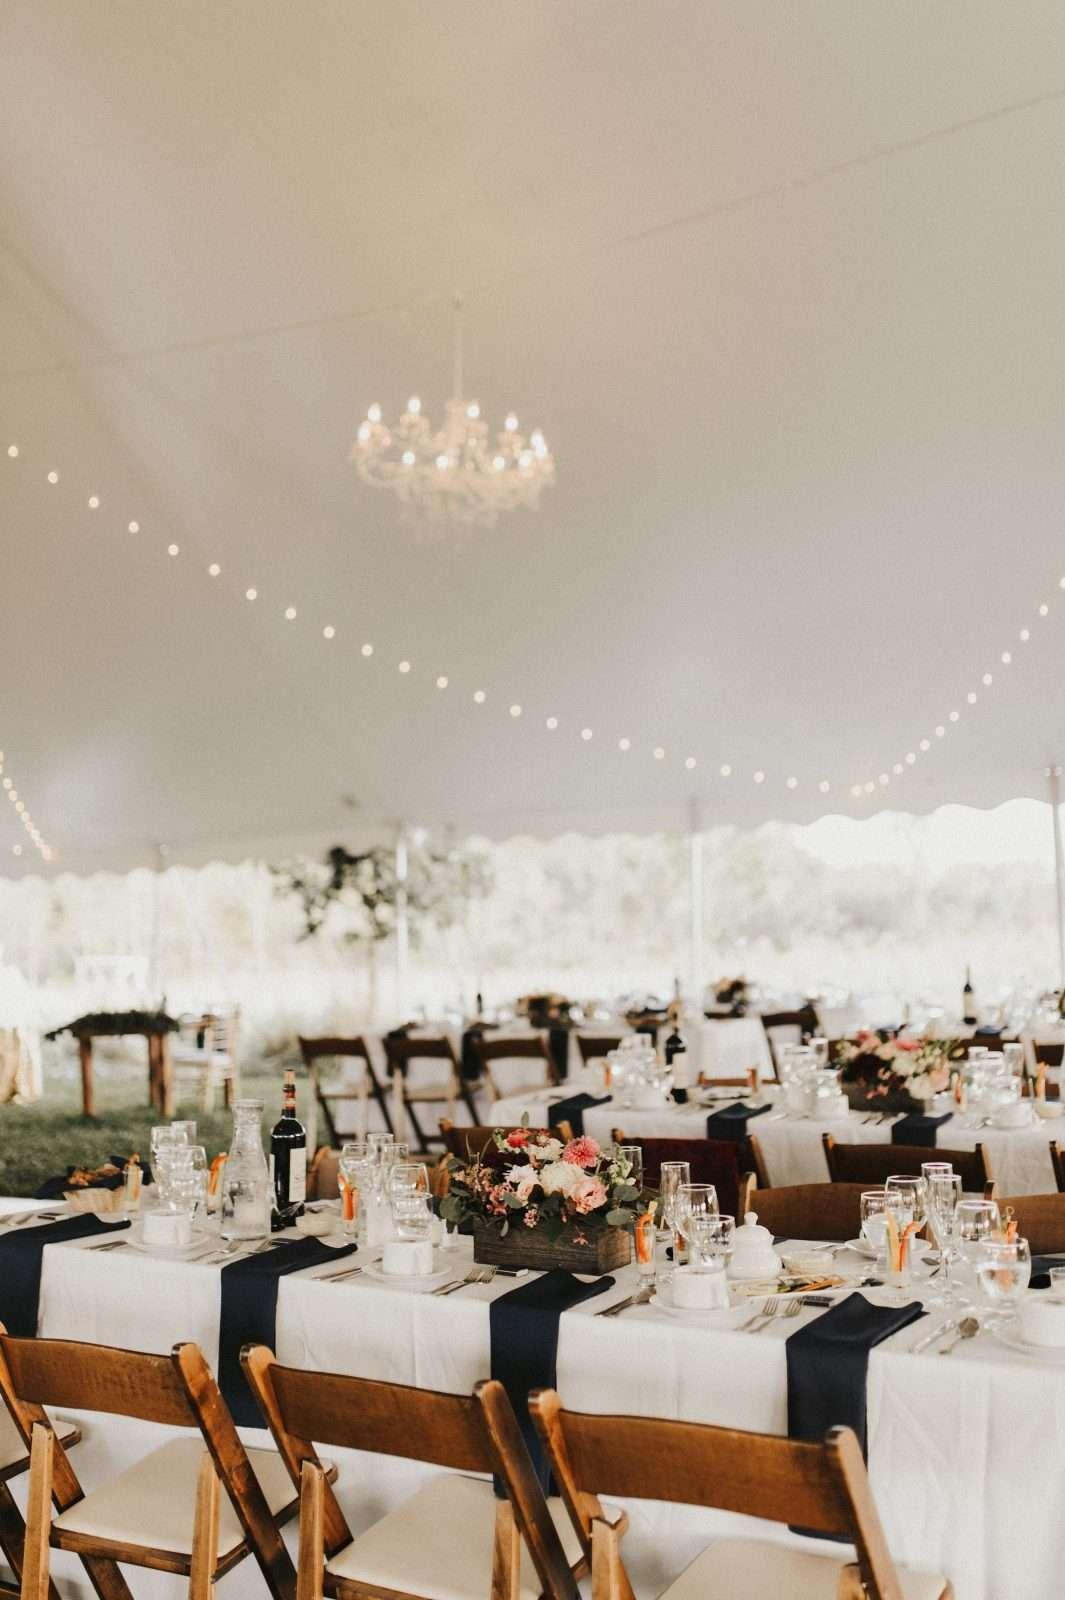 Bistro Lighting Farm Tables 60 X100 Pole Tent